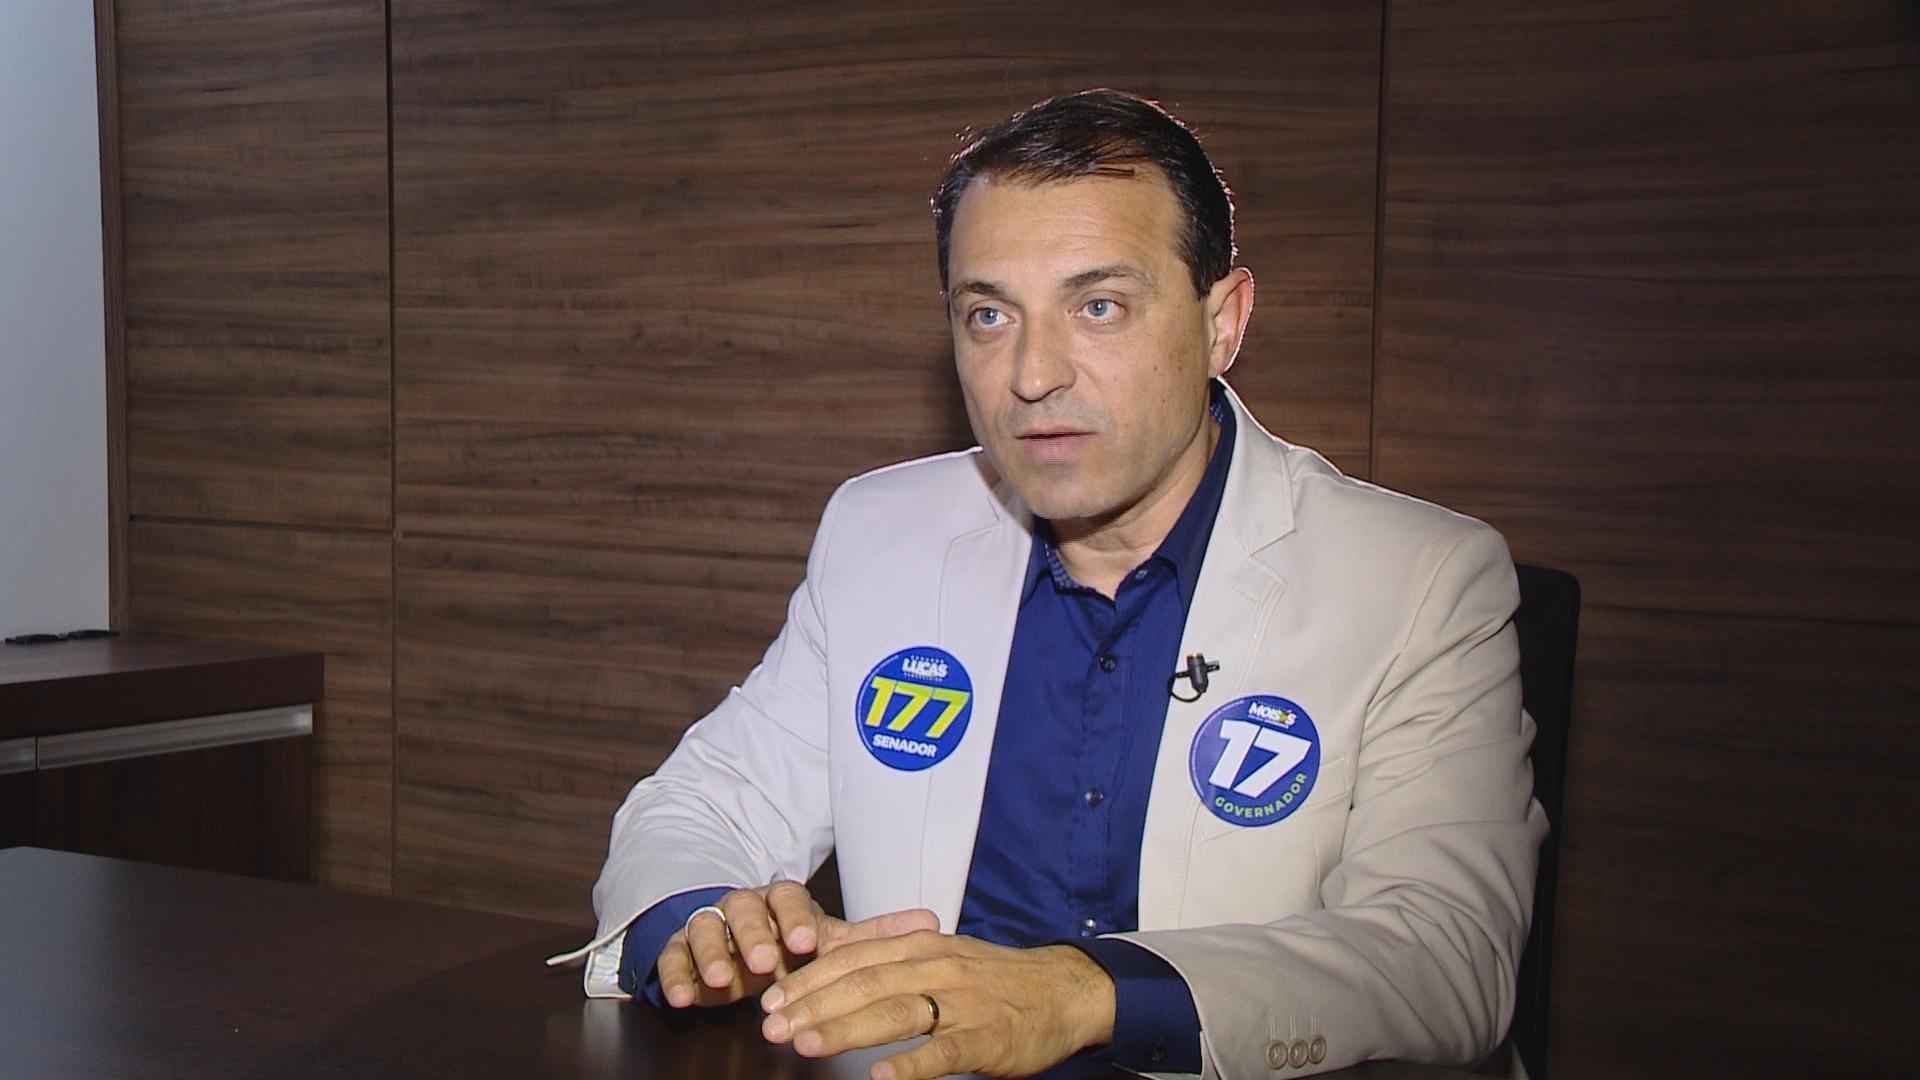 Candidato ao governo de SC Comandante Moisés (PSL) responde perguntas do G1